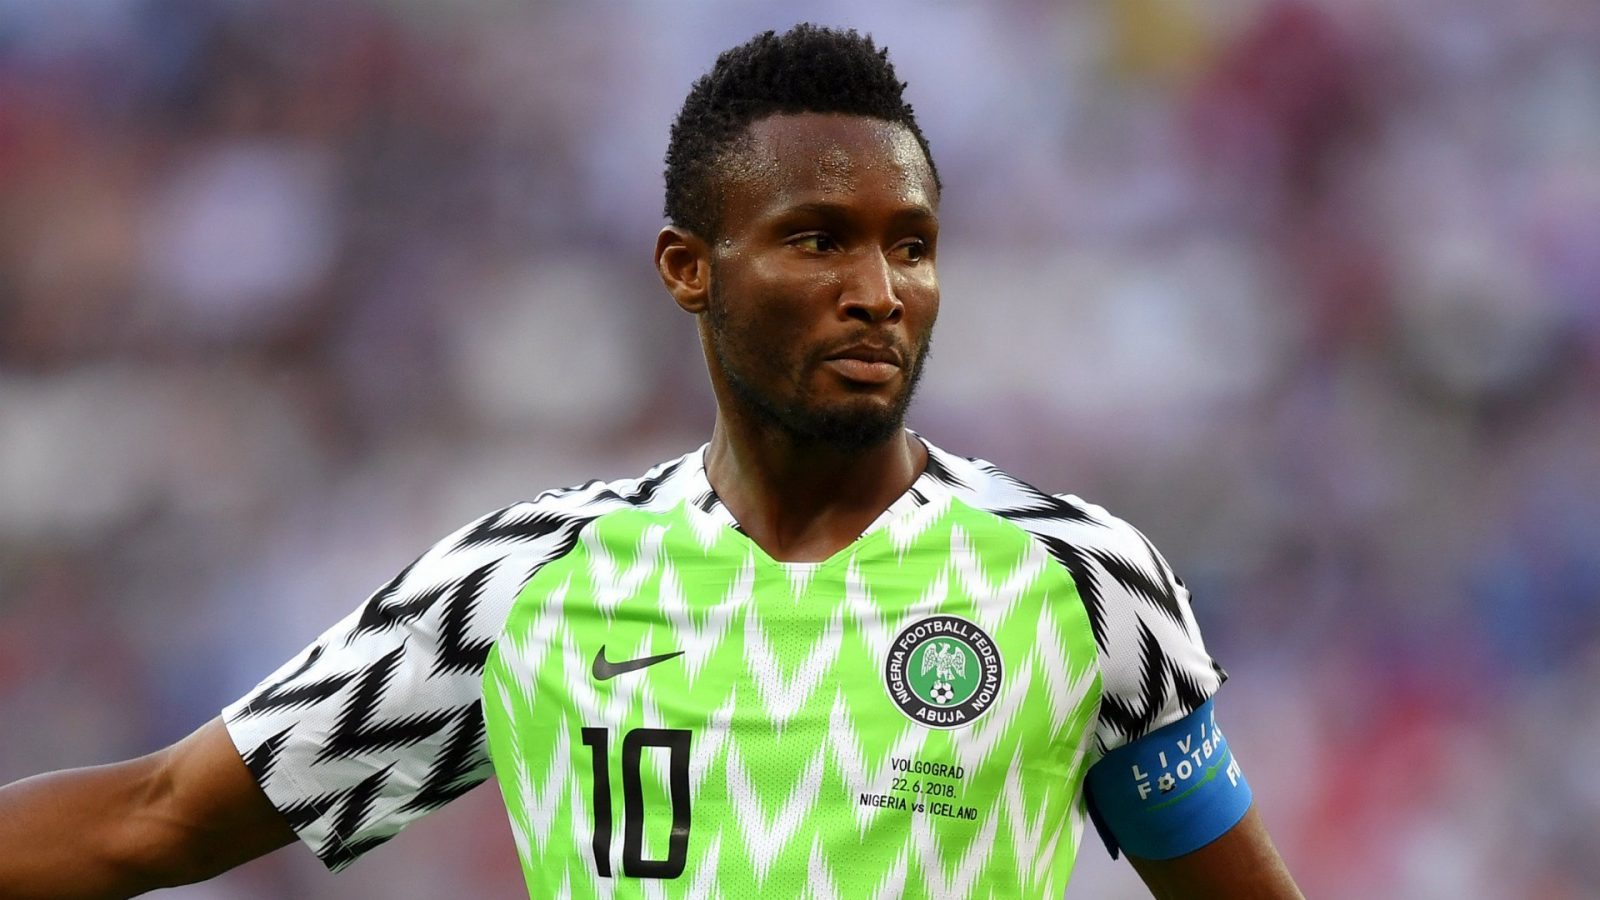 Nigeria's Mikel Obi retires from Super Eagles nest